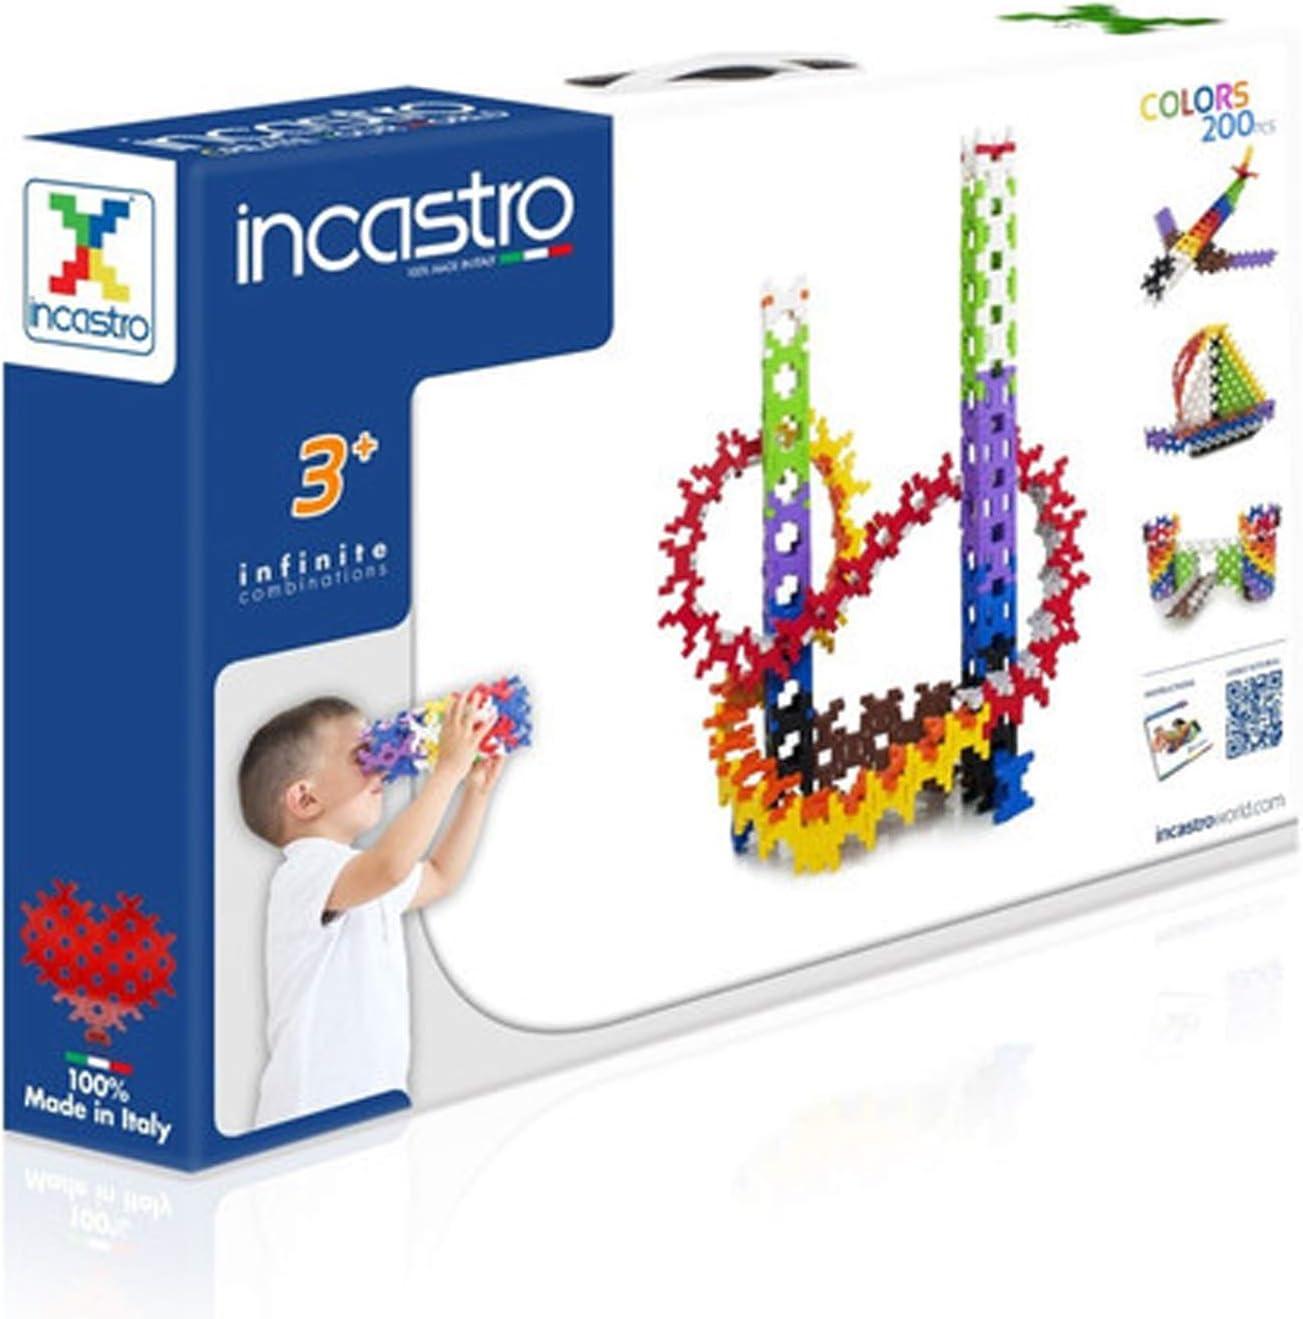 Multi-Colour Pack of 200 /Game of Construction Clip Box incastro Designer 042/